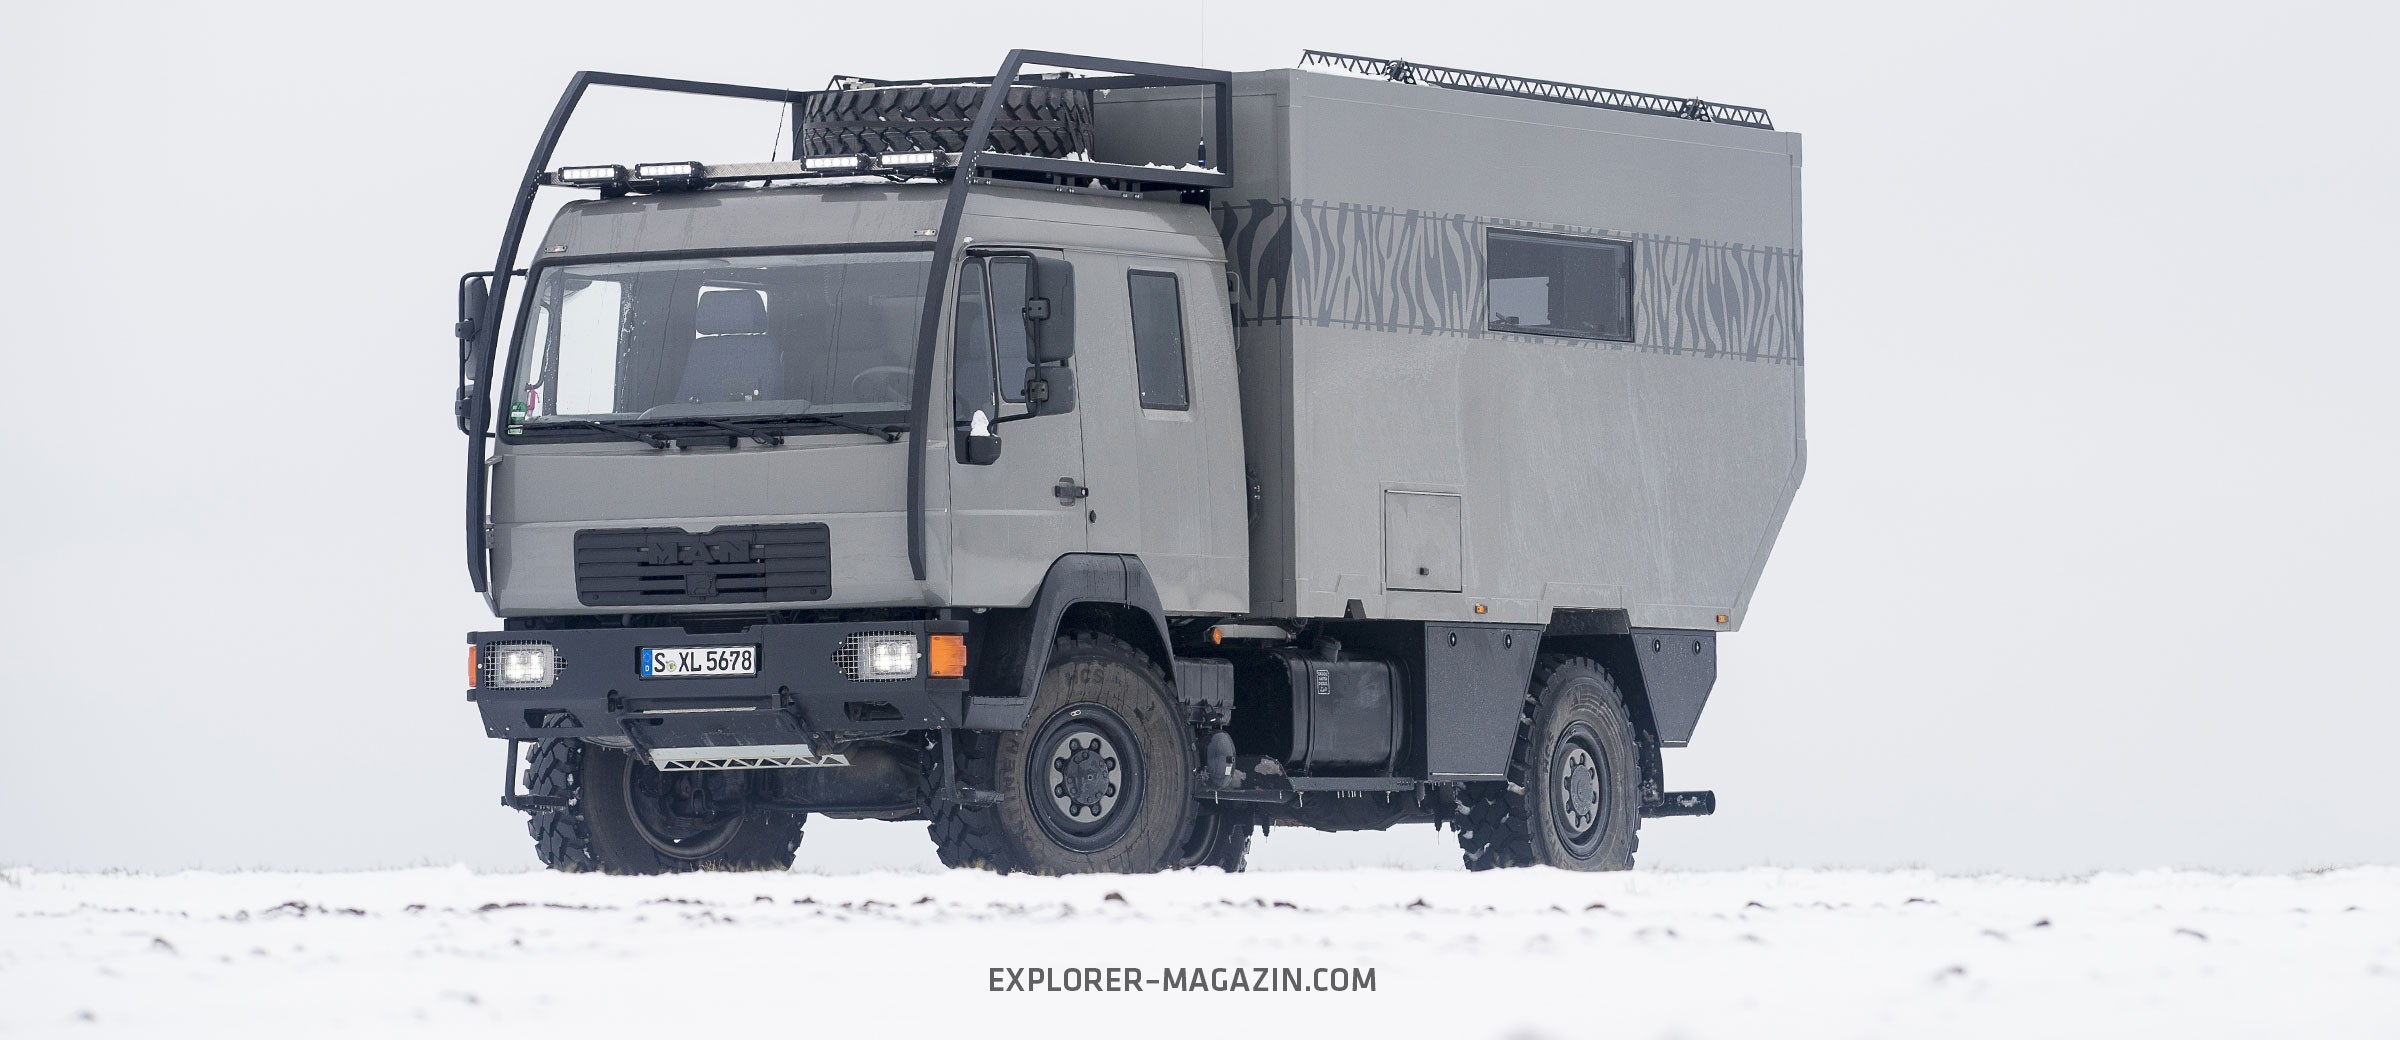 Architektenhaus – MAN L8 8x8-Wohnmobil  EXPLORER Magazin